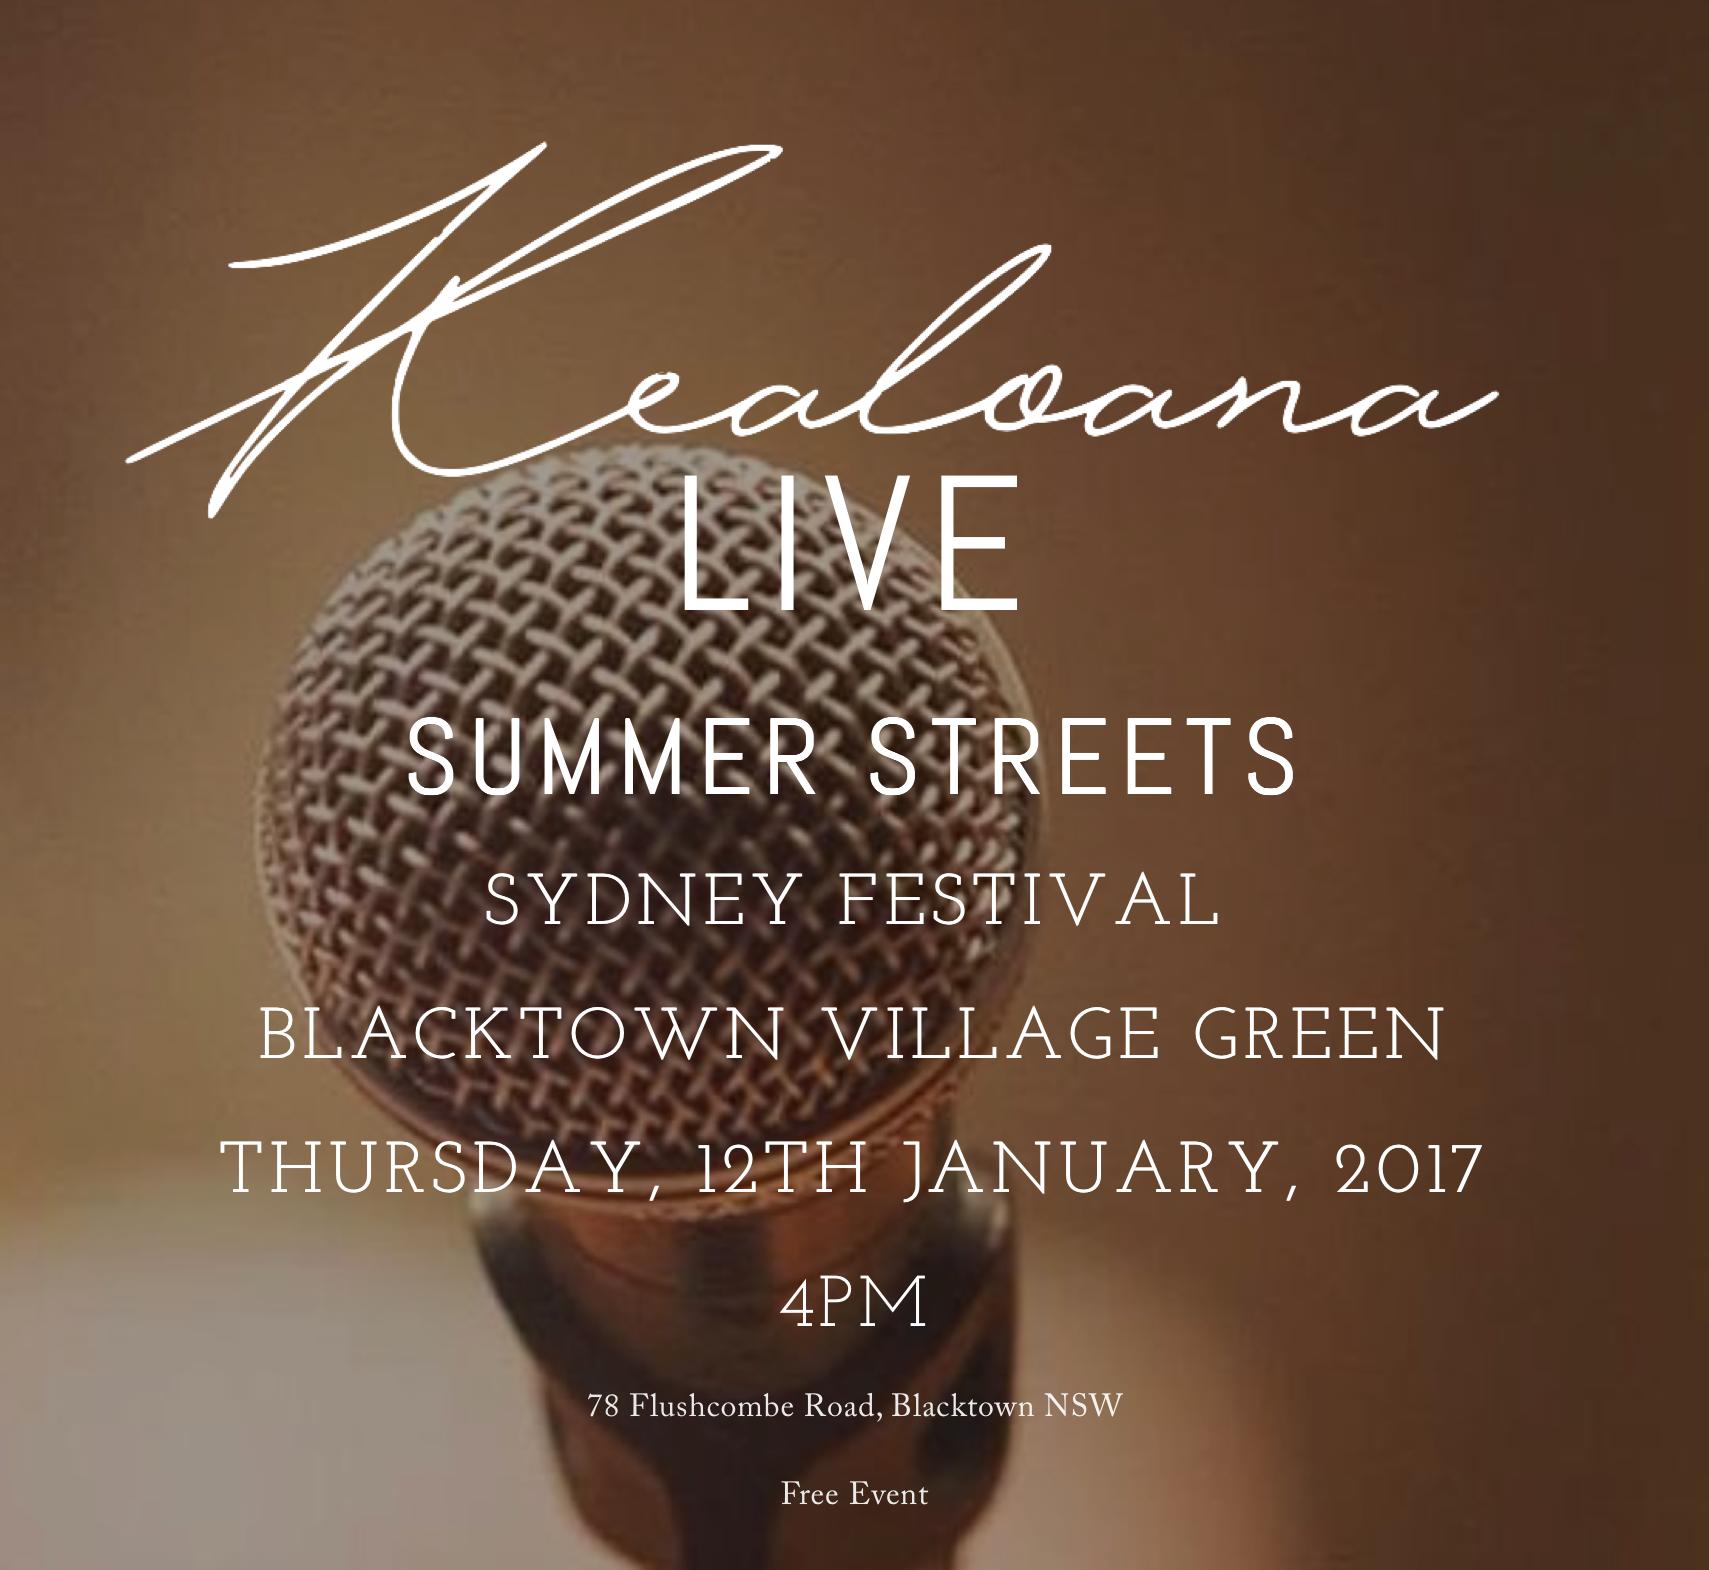 Kealoana @ Summer Street Festival 2017